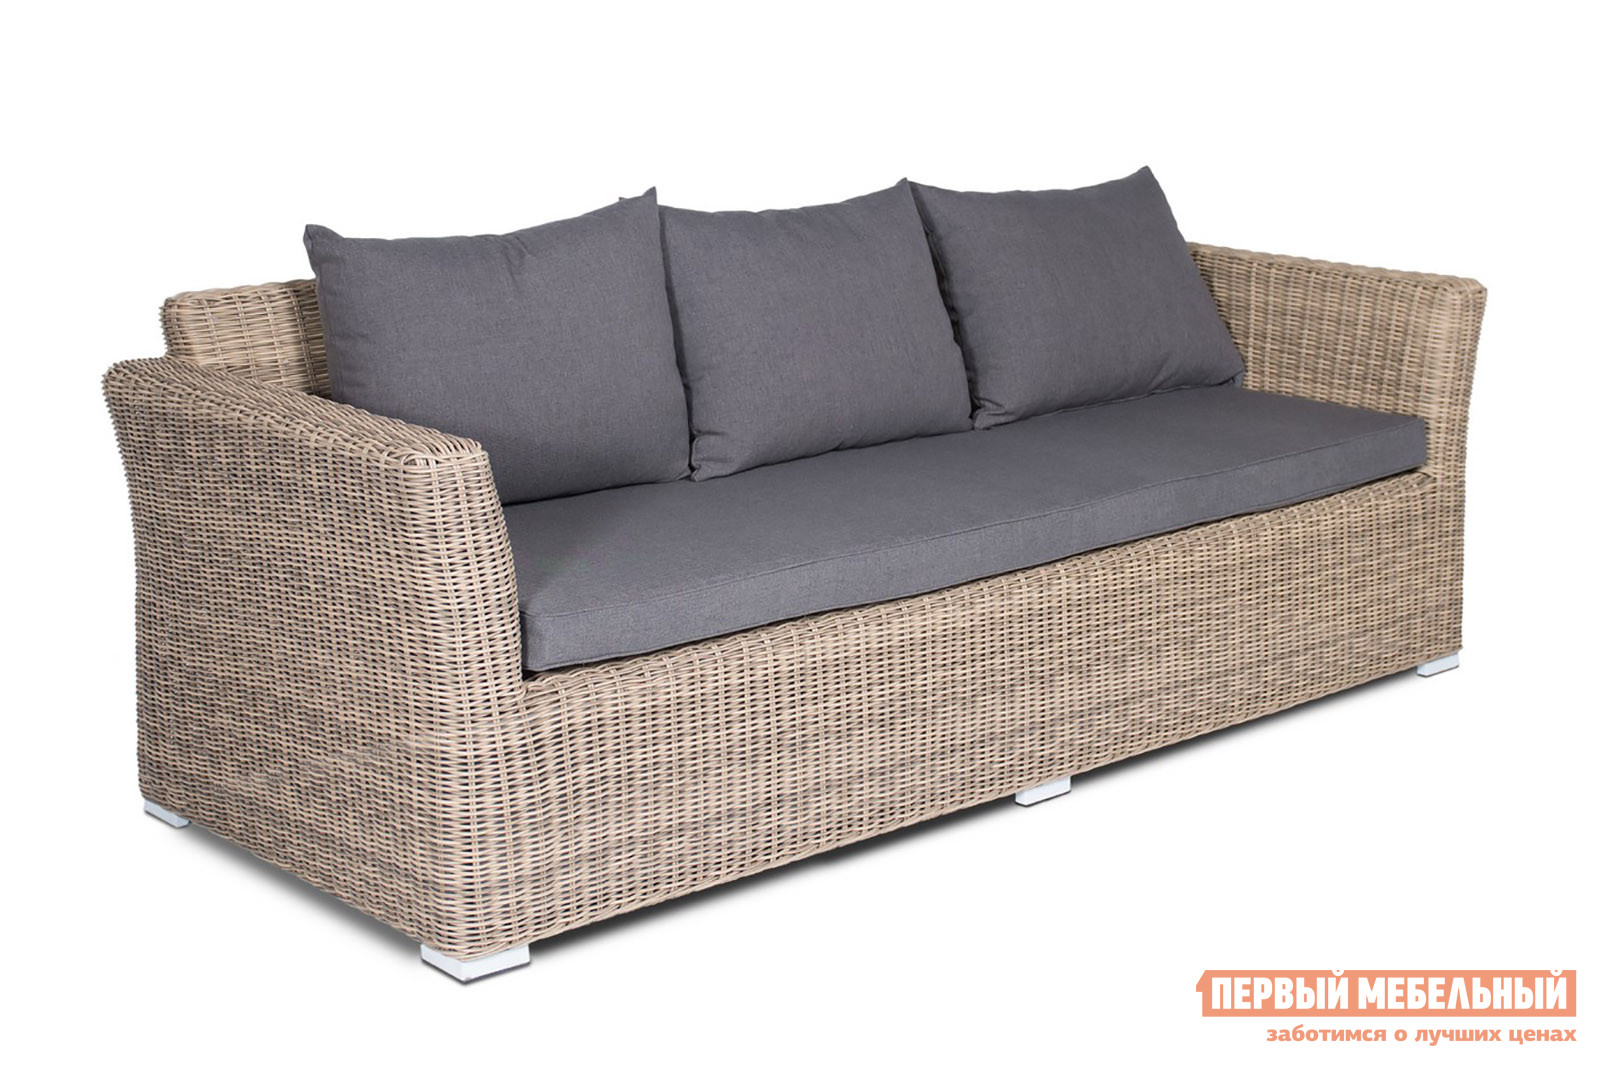 Плетеный диван Кватросис YH-C3130W-3 плетеный стол кватросис бергамо yh s4684p 2